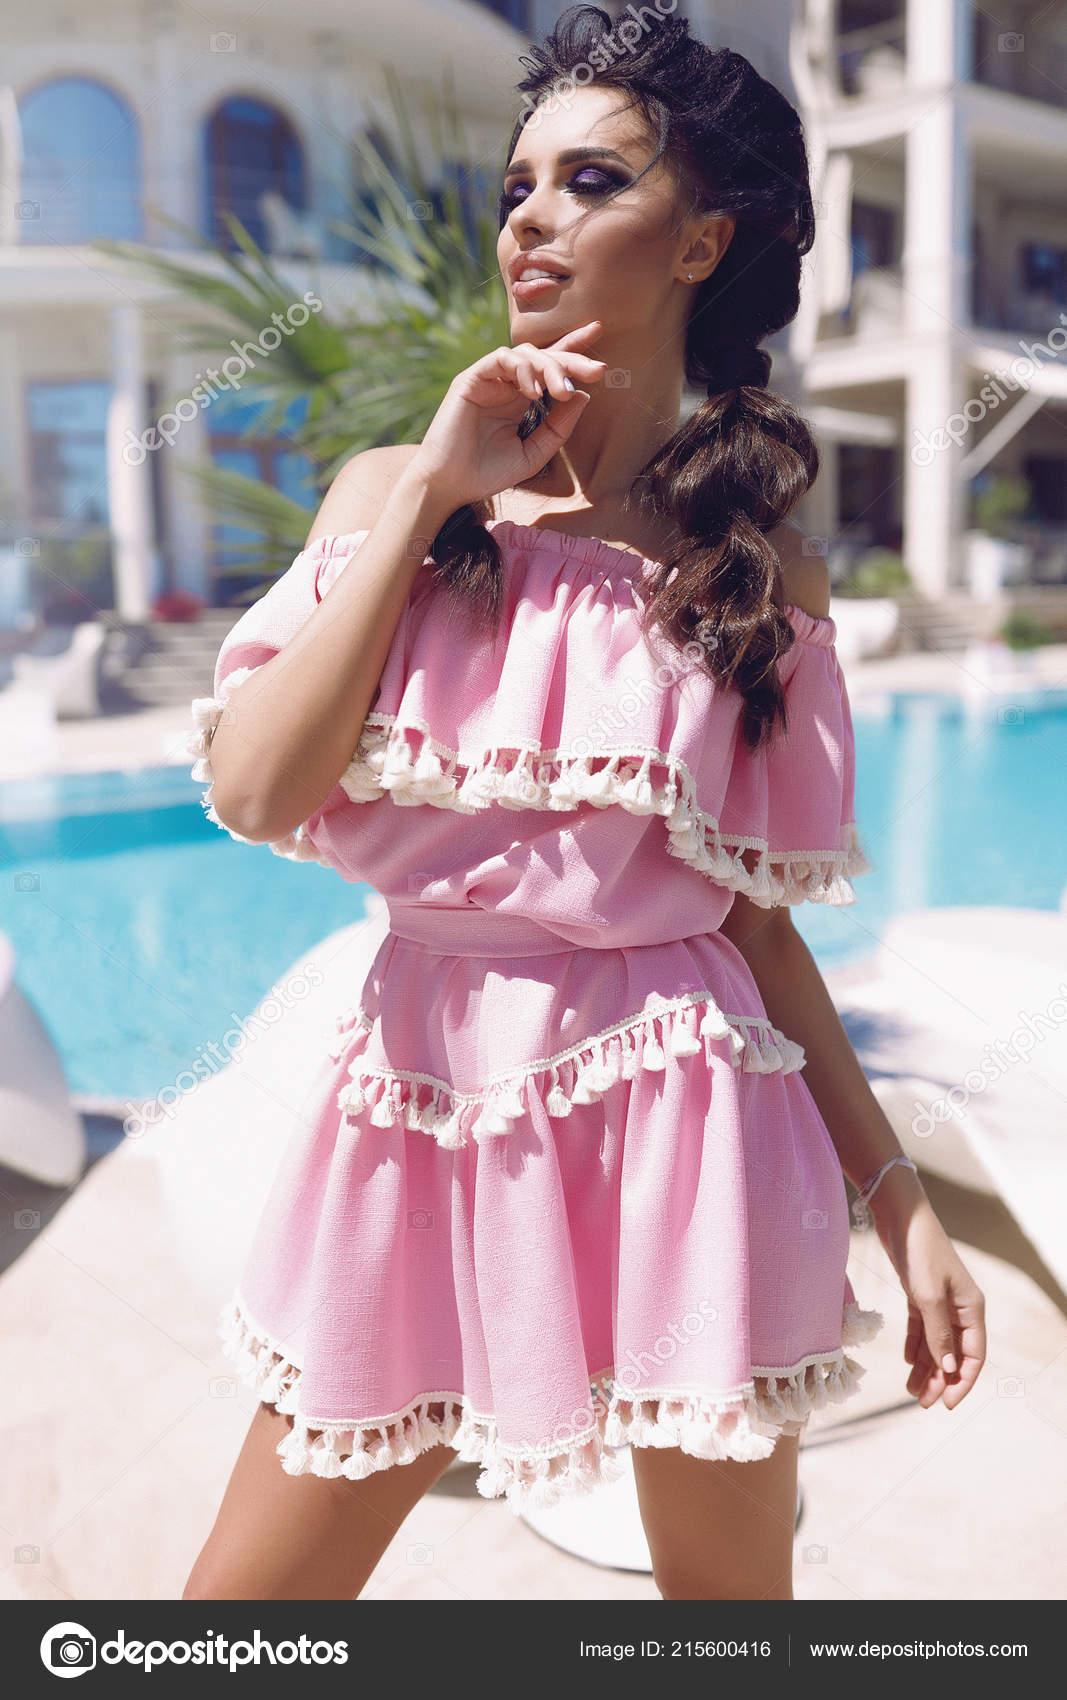 28ff509bfb4e Μοντέλο Στέκεται Δίπλα Στην Πισίνα Στο Σύντομο Φόρεμα Ροζ Χέρι ...